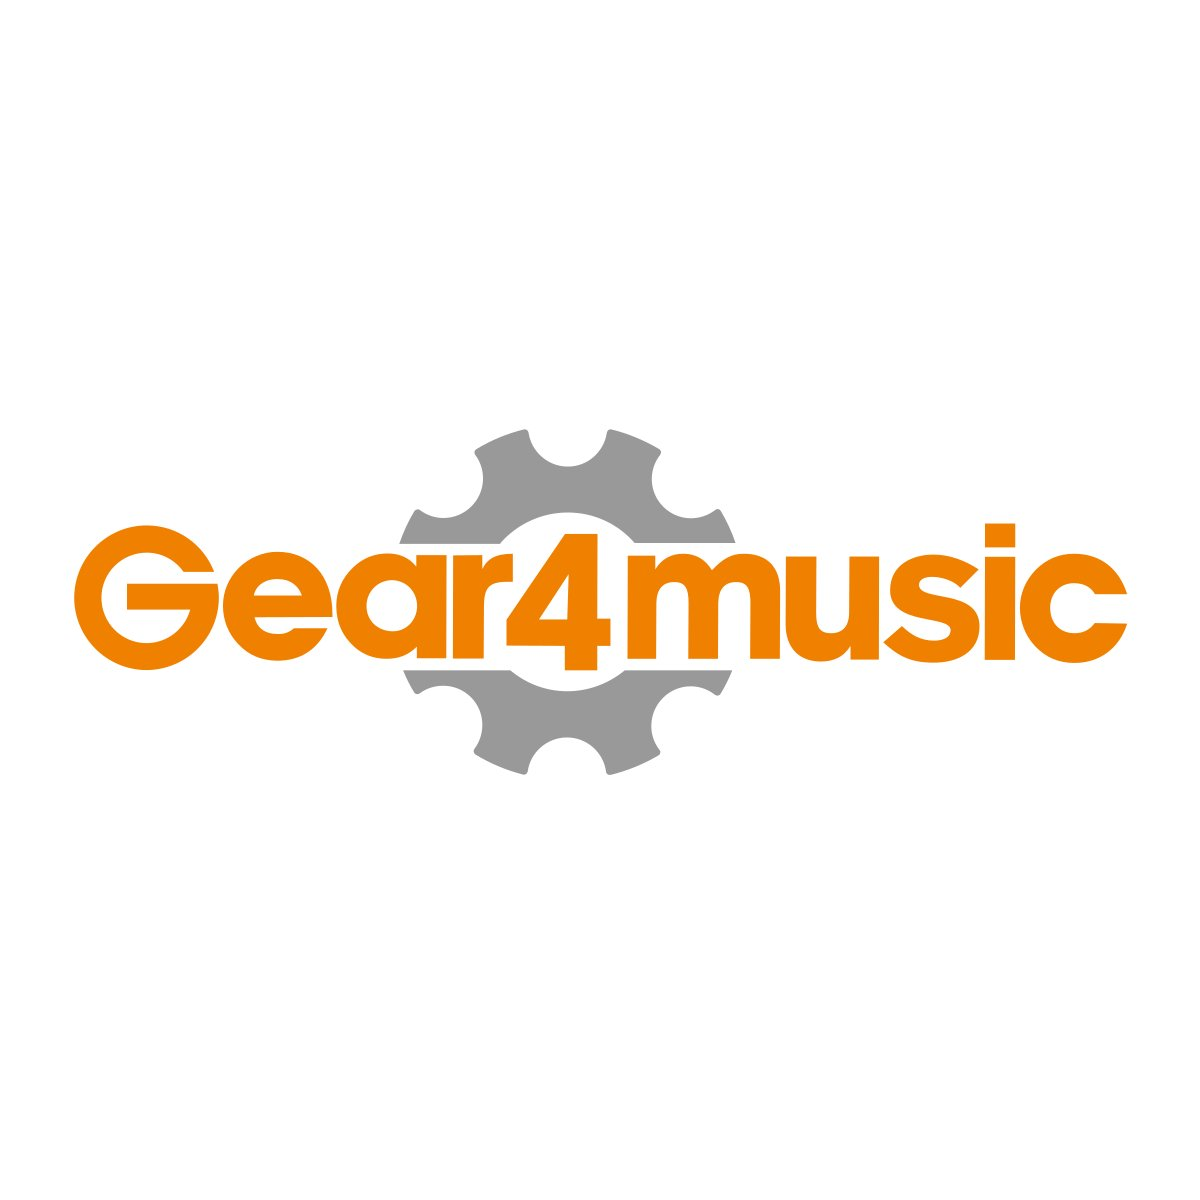 Elektrisk Bass ABS Kasse, Rektangulær fra Gear4music